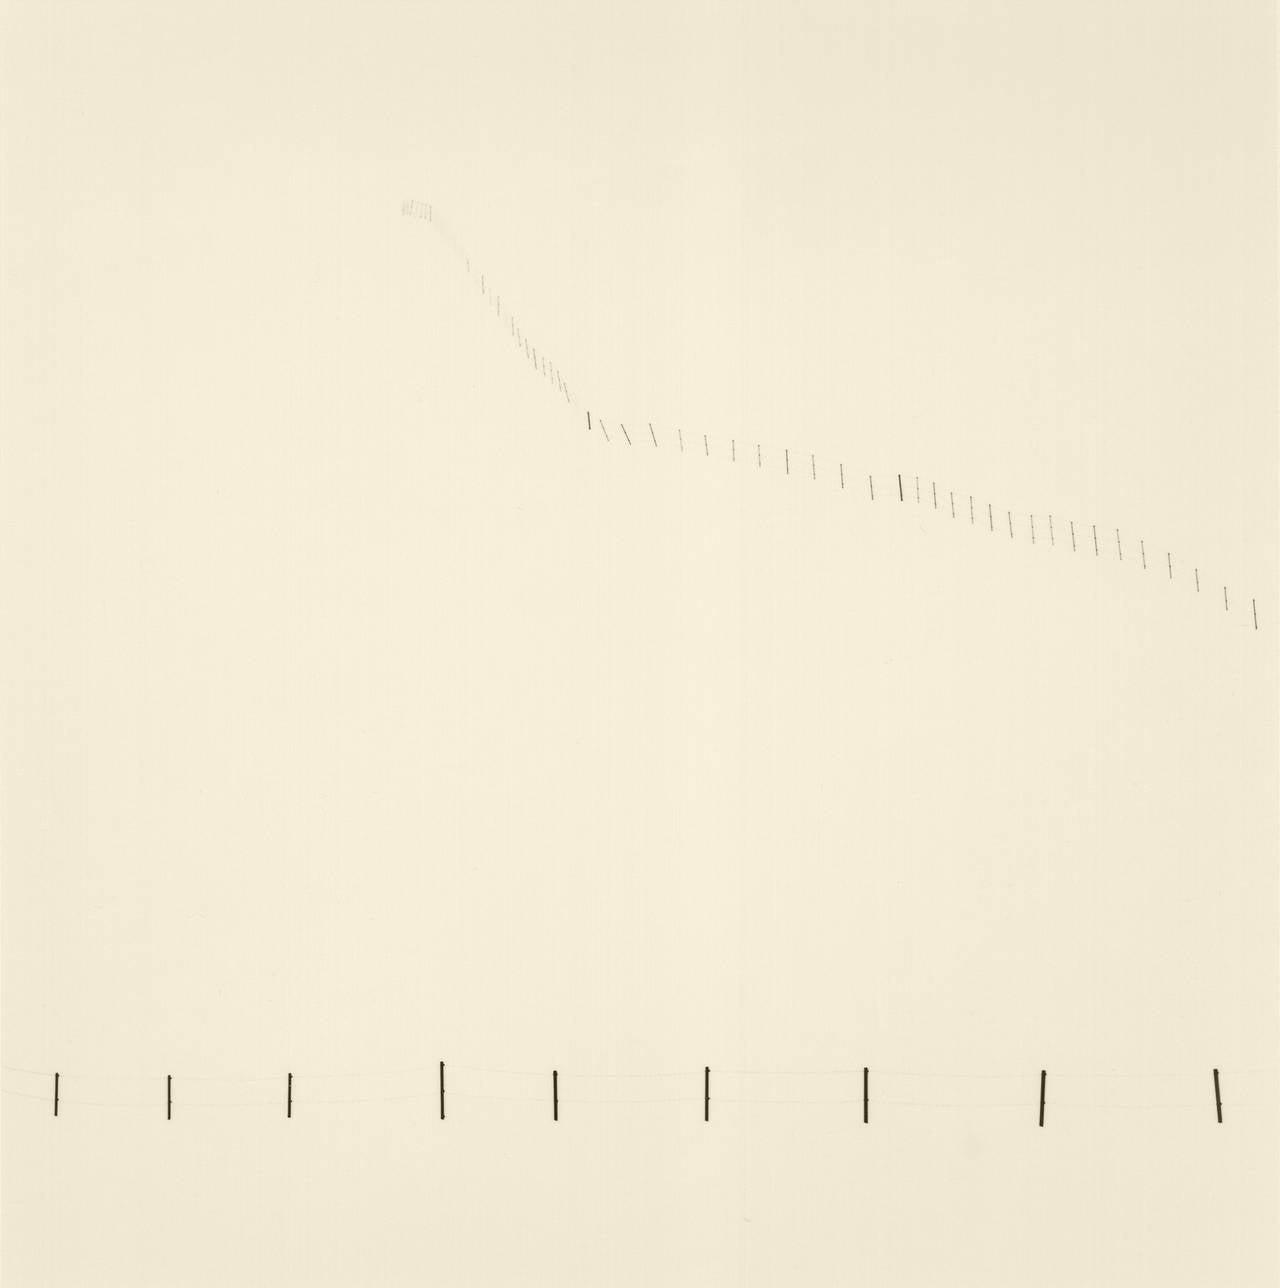 Michael Kenna Black and White Photograph - Hillside Fence, Study 3, Teshikaga, Hokkaido, Japan